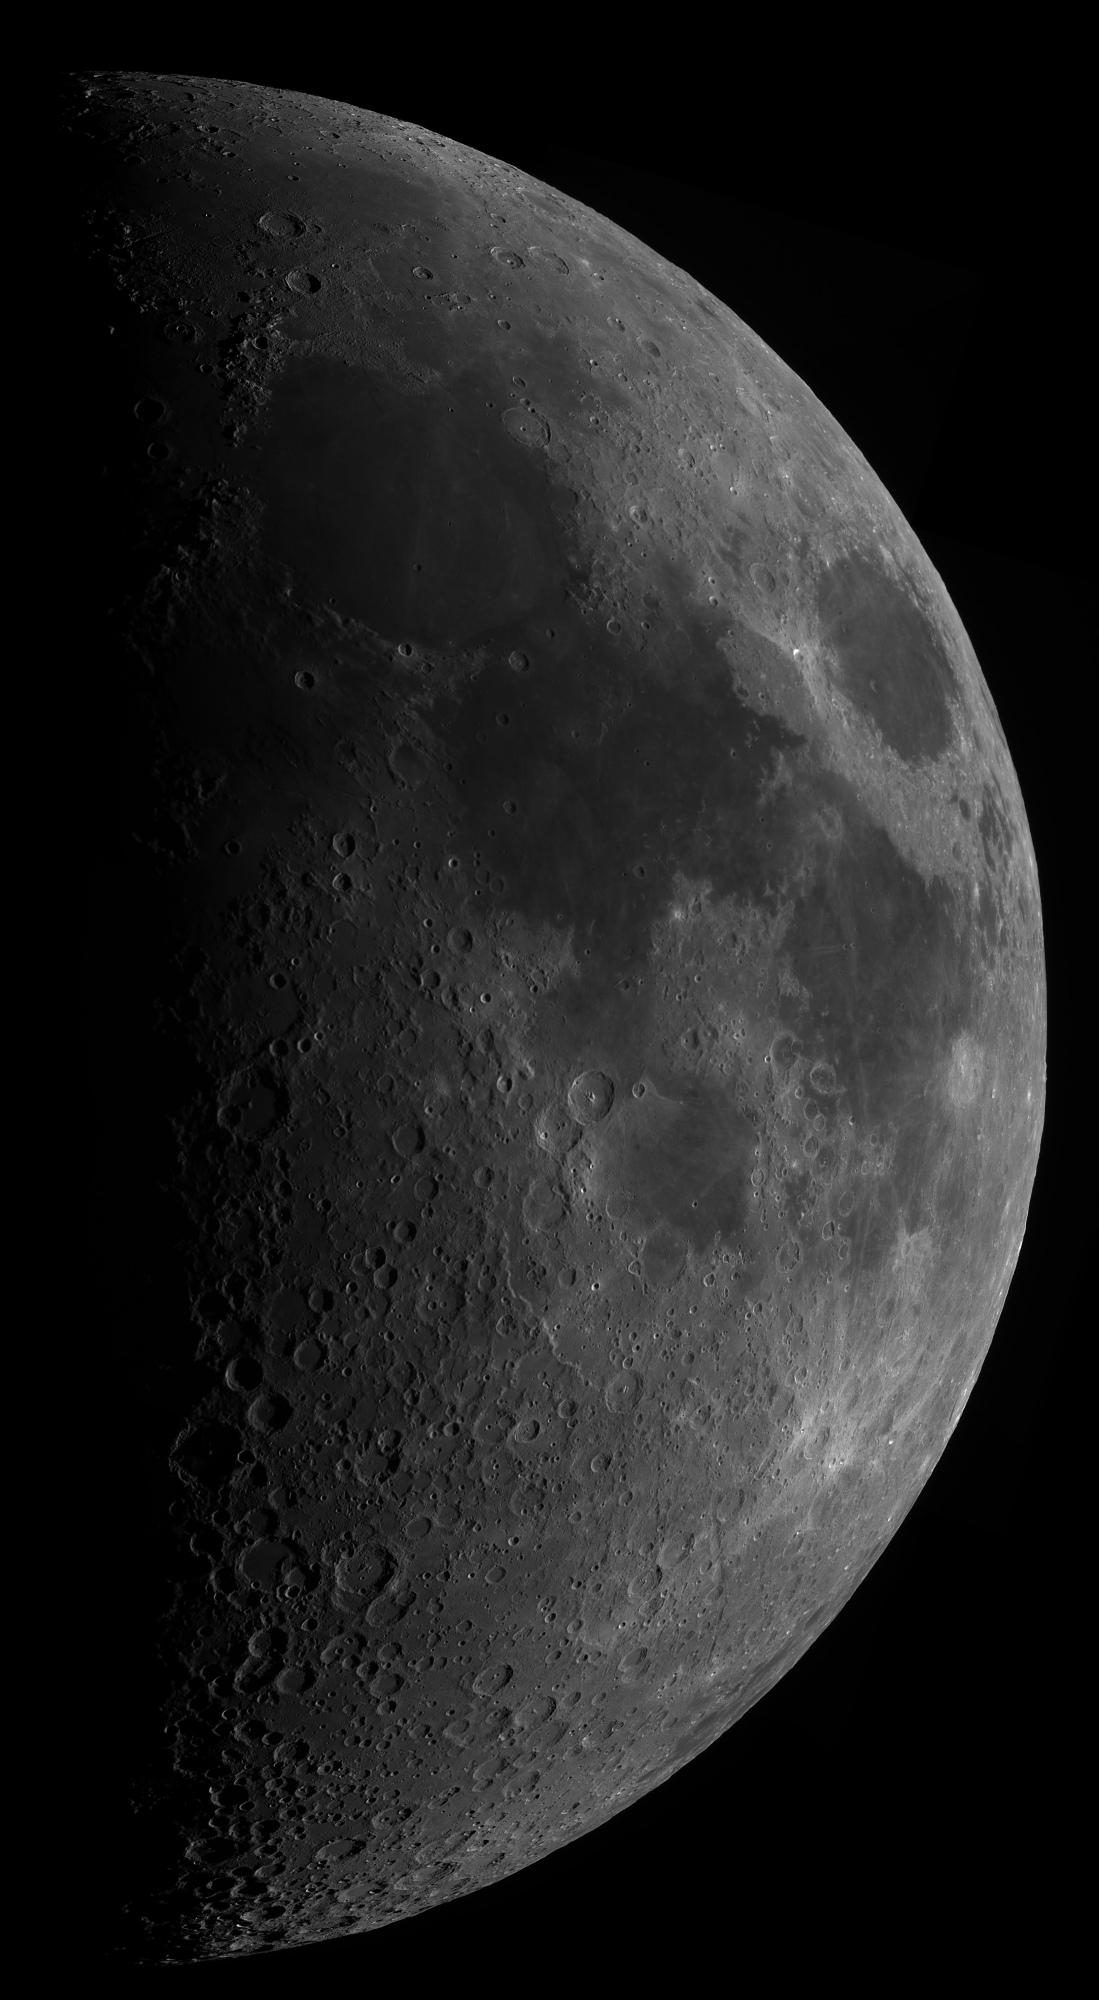 Moon_200529_stitch_50.thumb.jpg.5111ca4d494fa00a63cd00c79ec2cf95.jpg